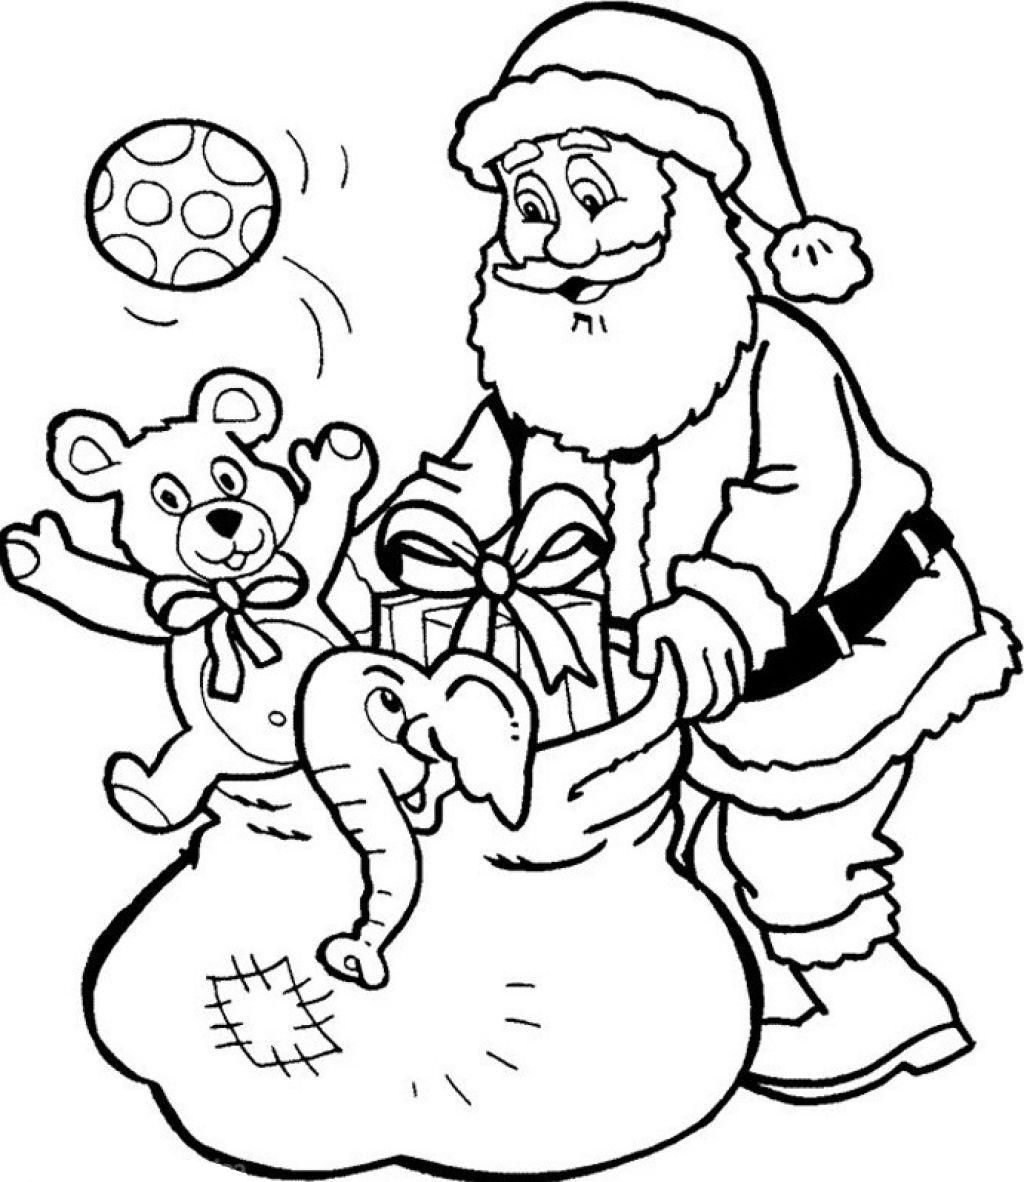 Santa Claus Coloring Pages  Santa coloring pages, Coloring pages